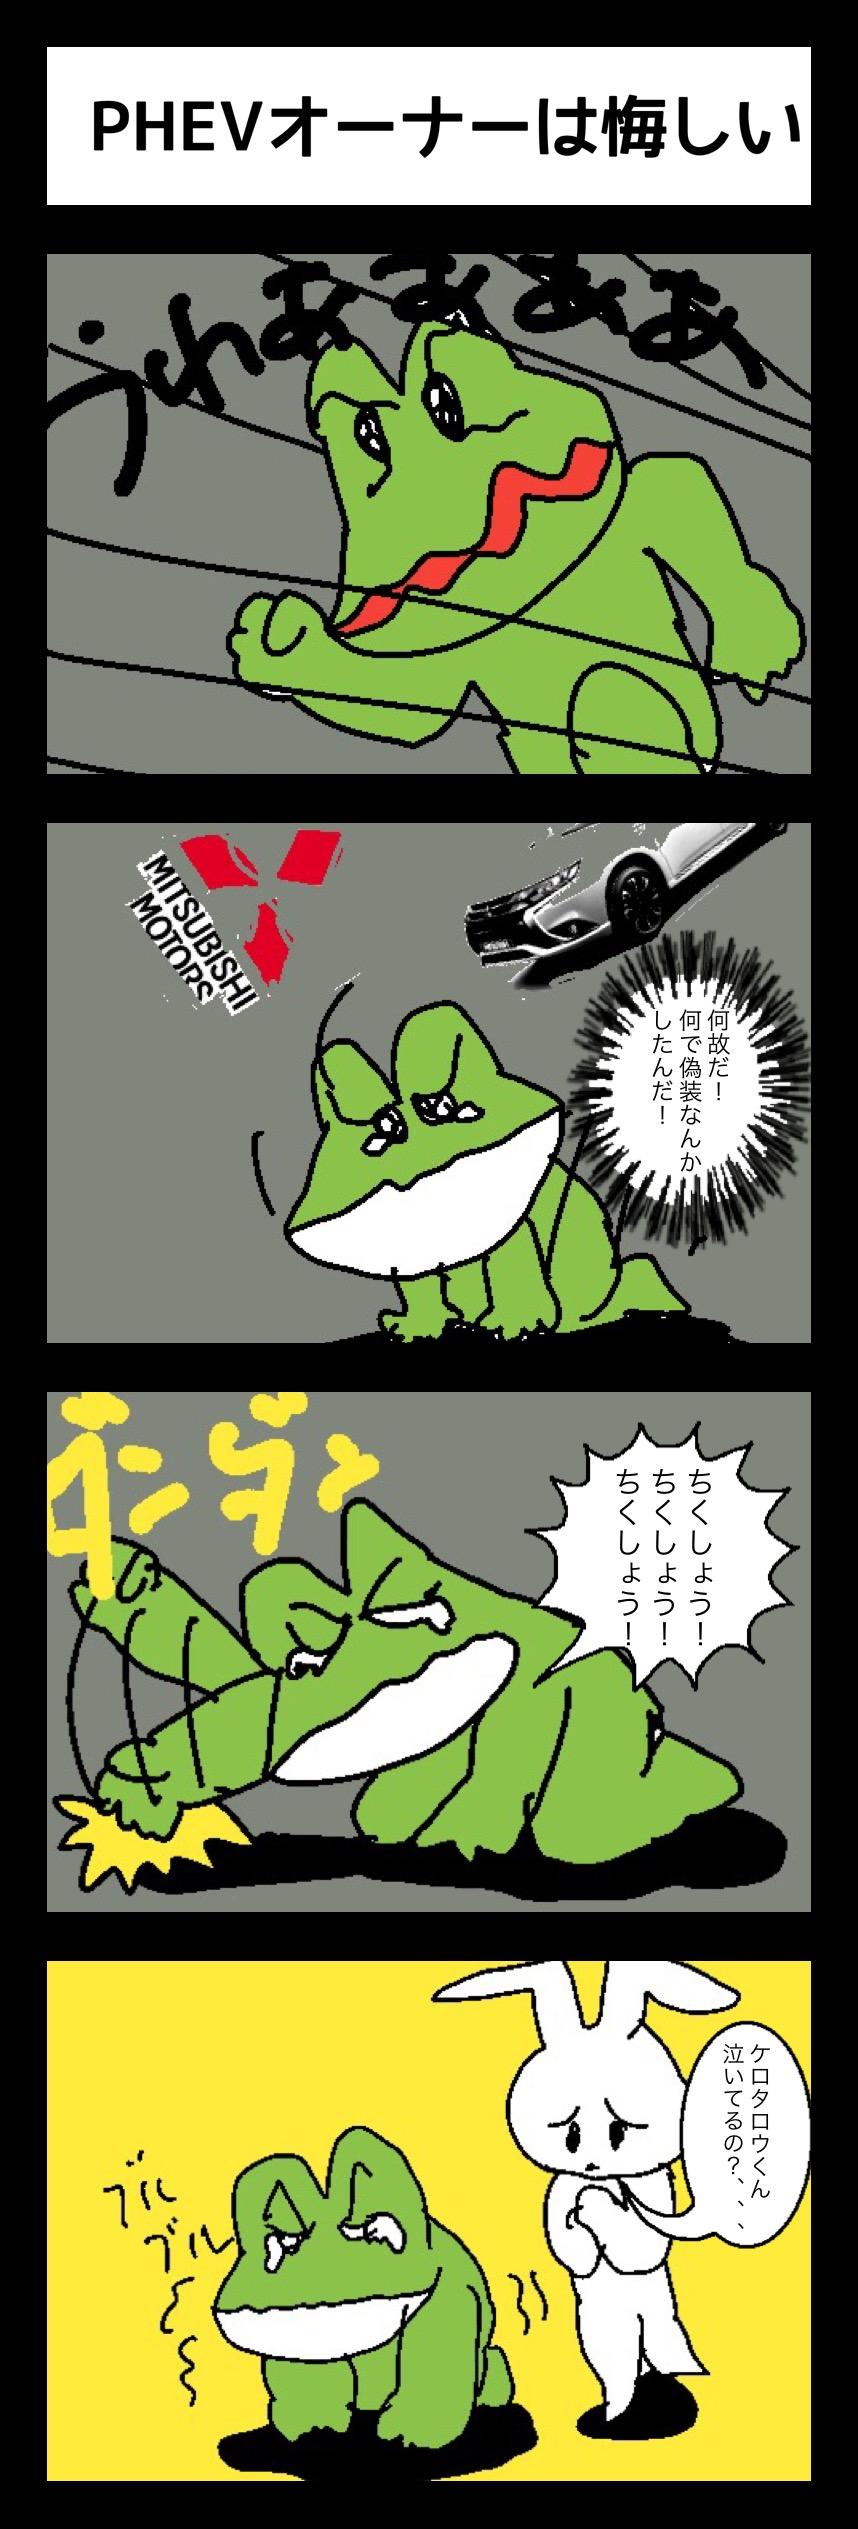 PHEV鳥獣戯画 その15 悔しいPHEVオーナー